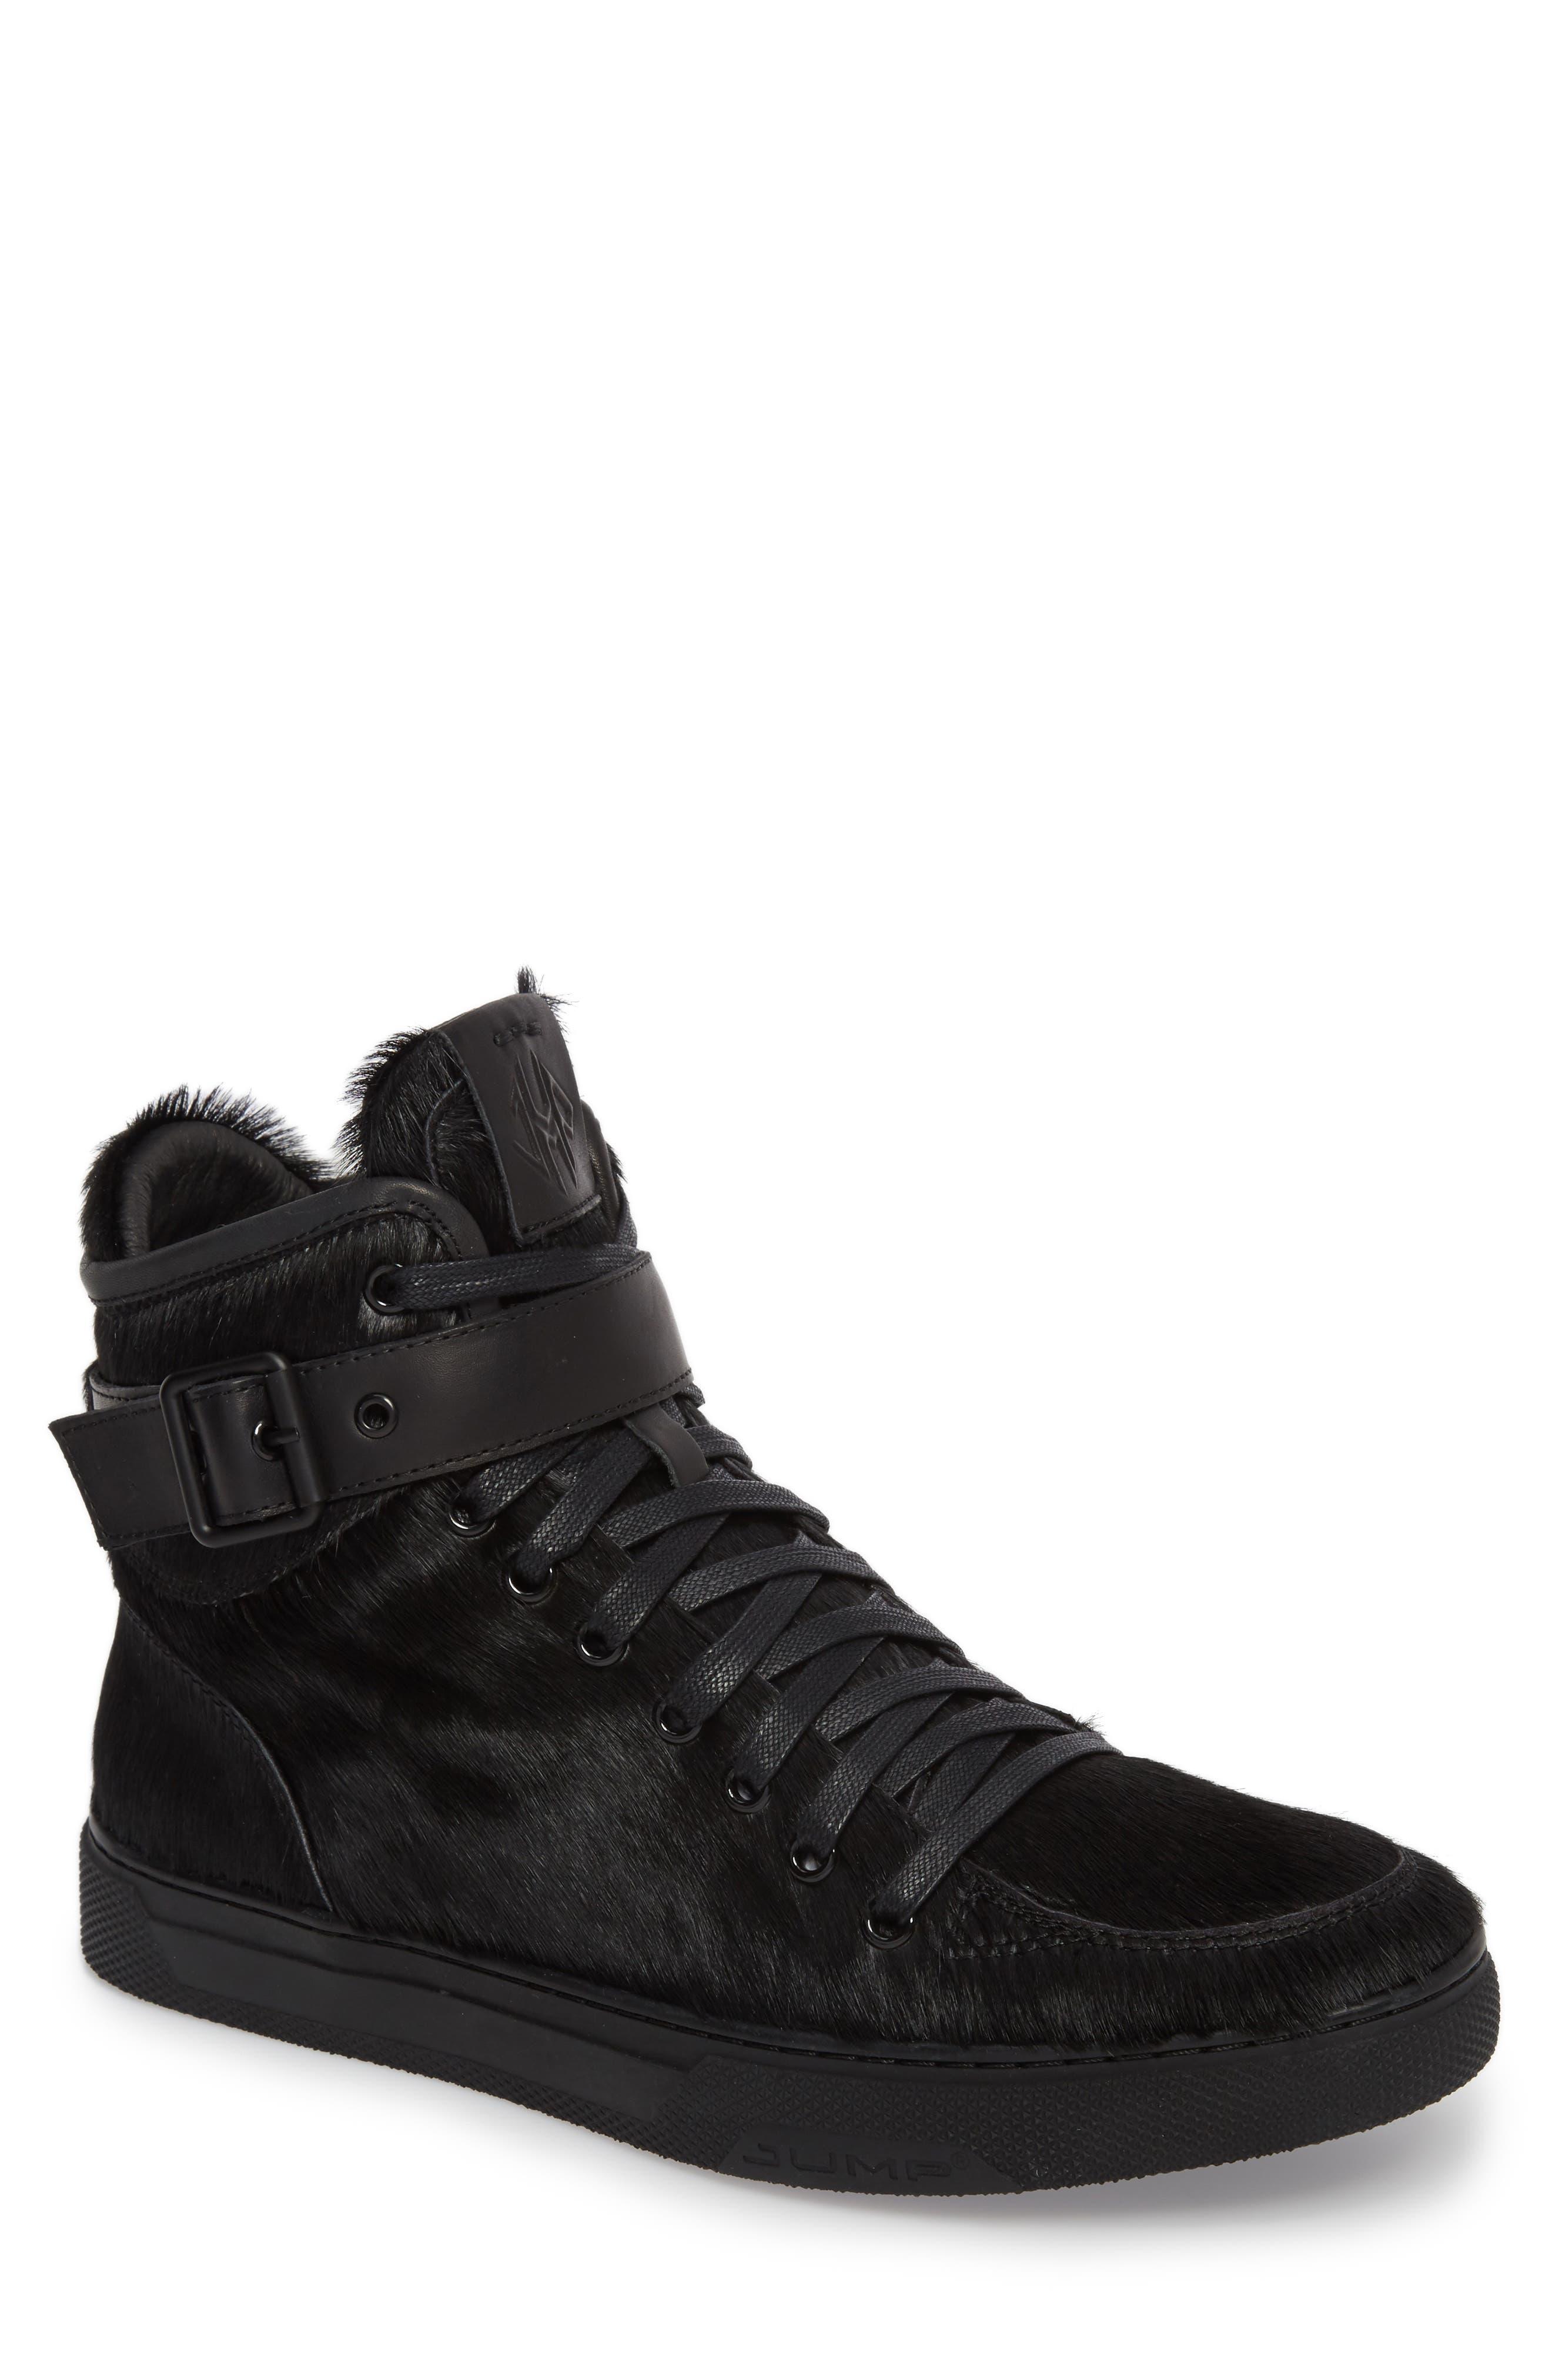 Sullivan Genuine Calf Hair High Top Sneaker,                         Main,                         color, 002